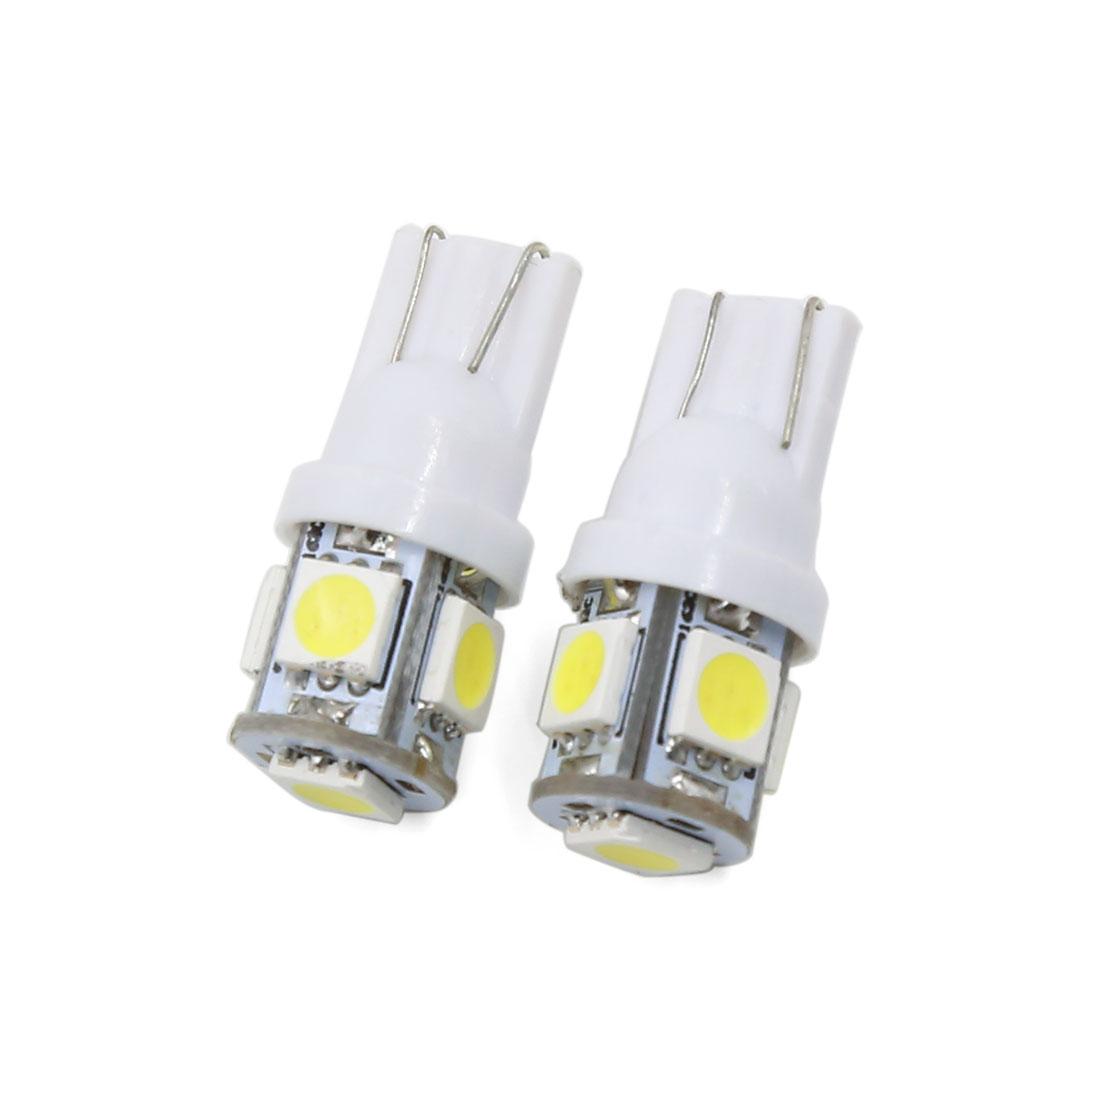 T10 5050 SMD 5 LED Side Wedge Light White Turn Signal Lamp Bulb 2 Pcs Interior